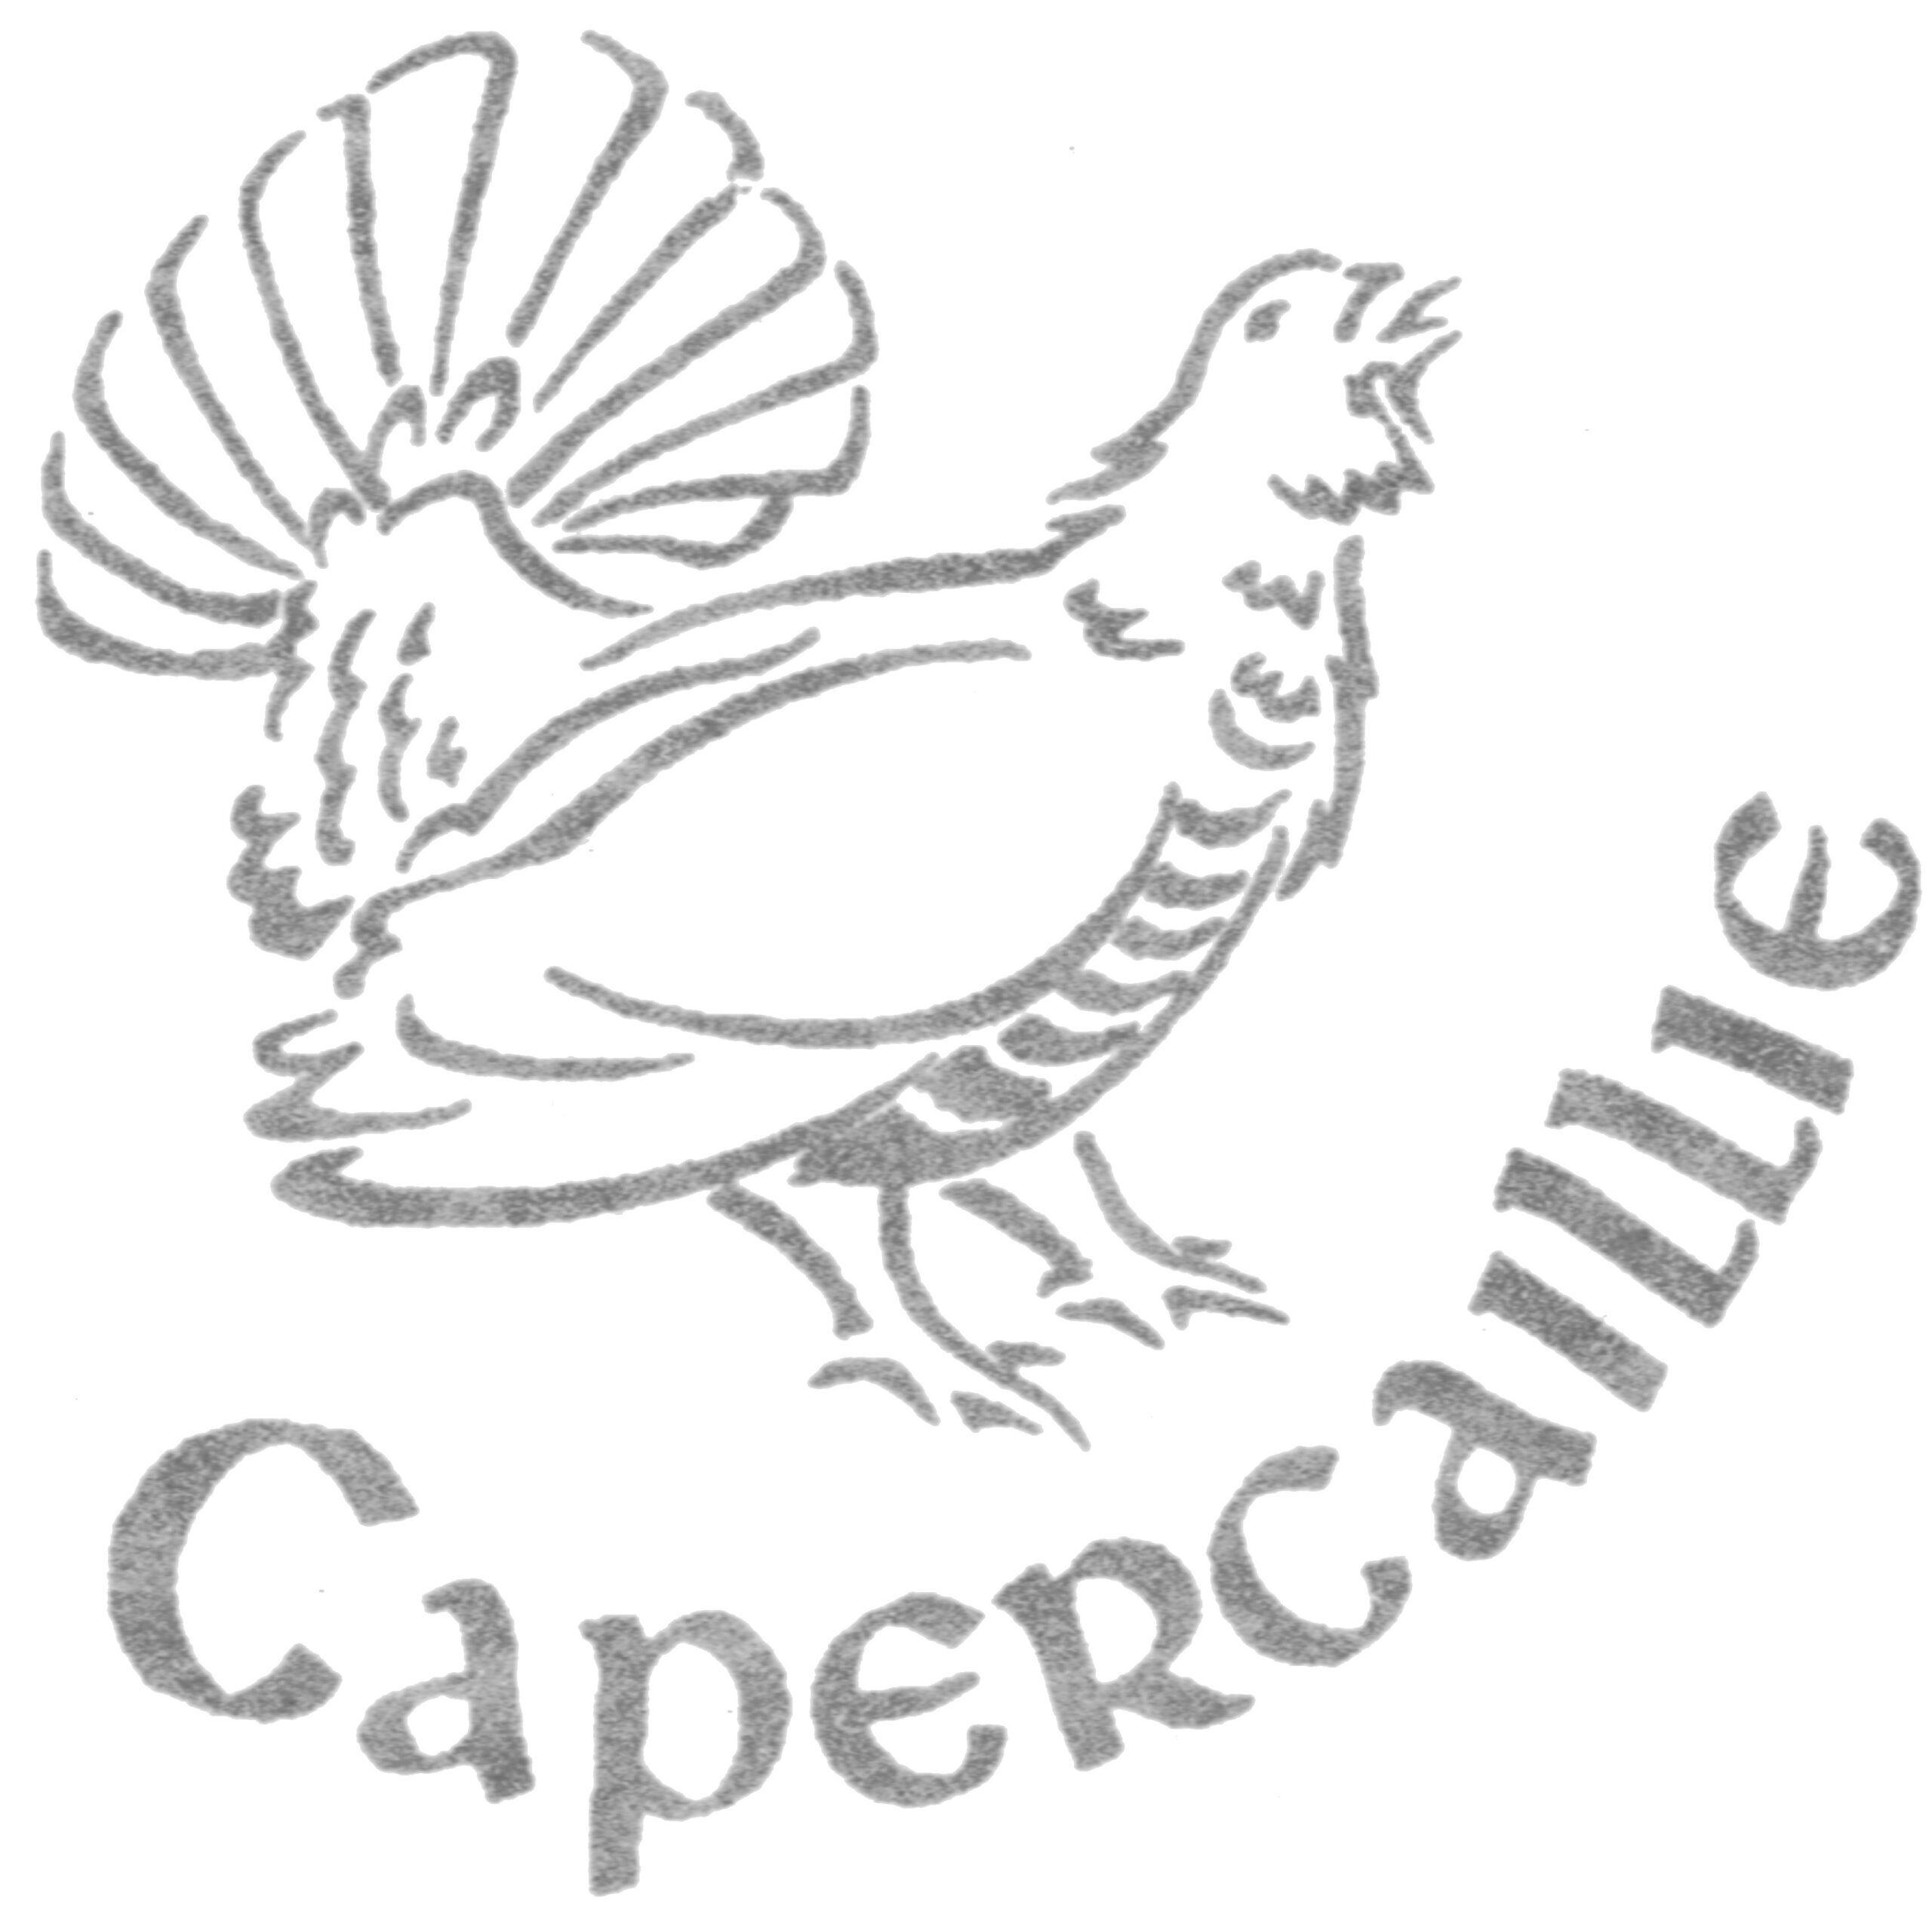 Capercaillie Travel Ltd